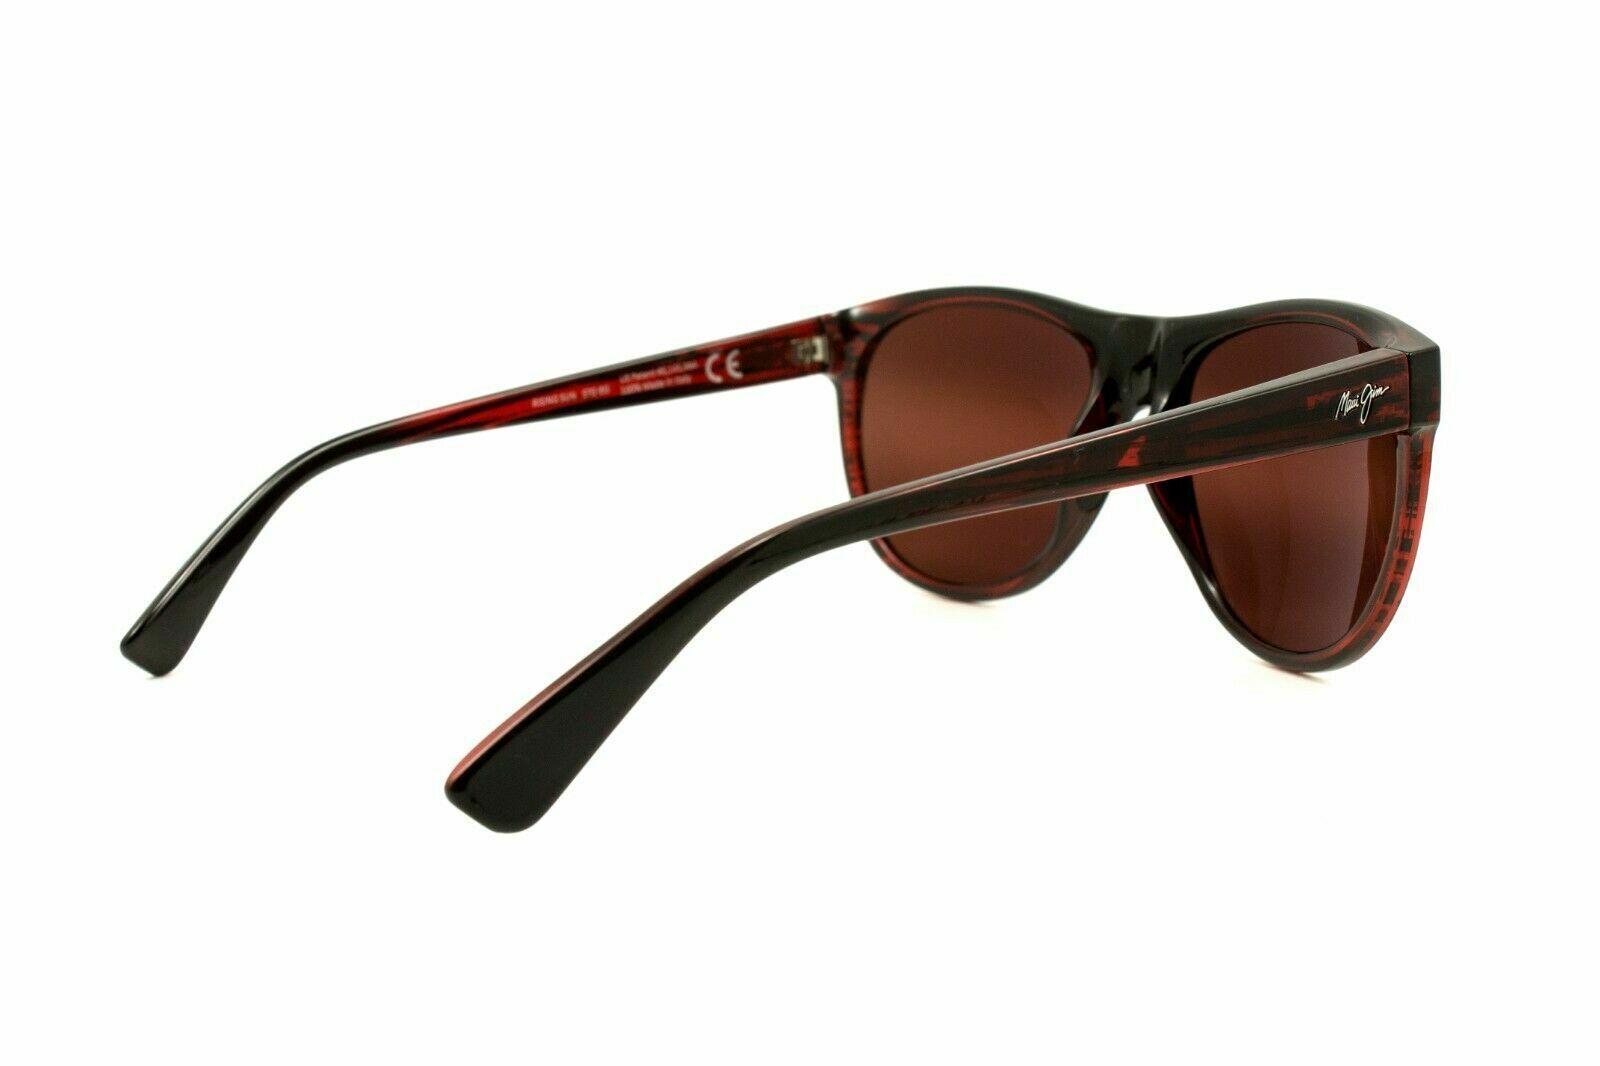 Maui Jim RISING SUN R731-07C Burgundy Sunglasses Polarized Maui Rose Lenses